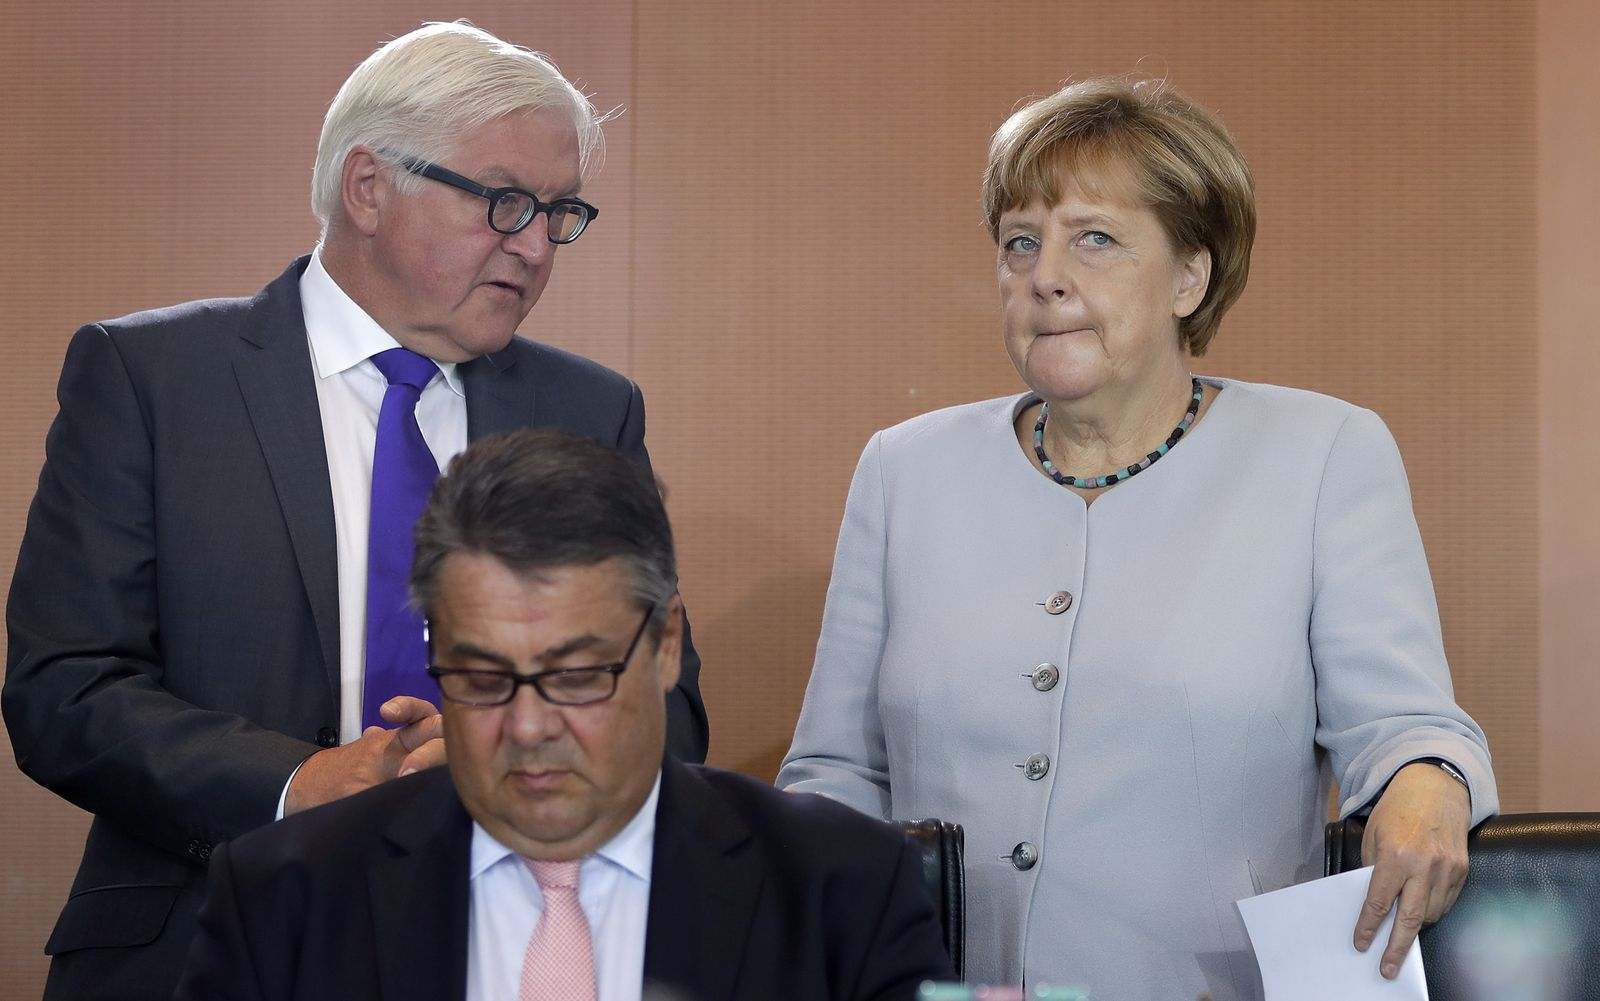 Merkel/ Steinmeier/ Gabriel